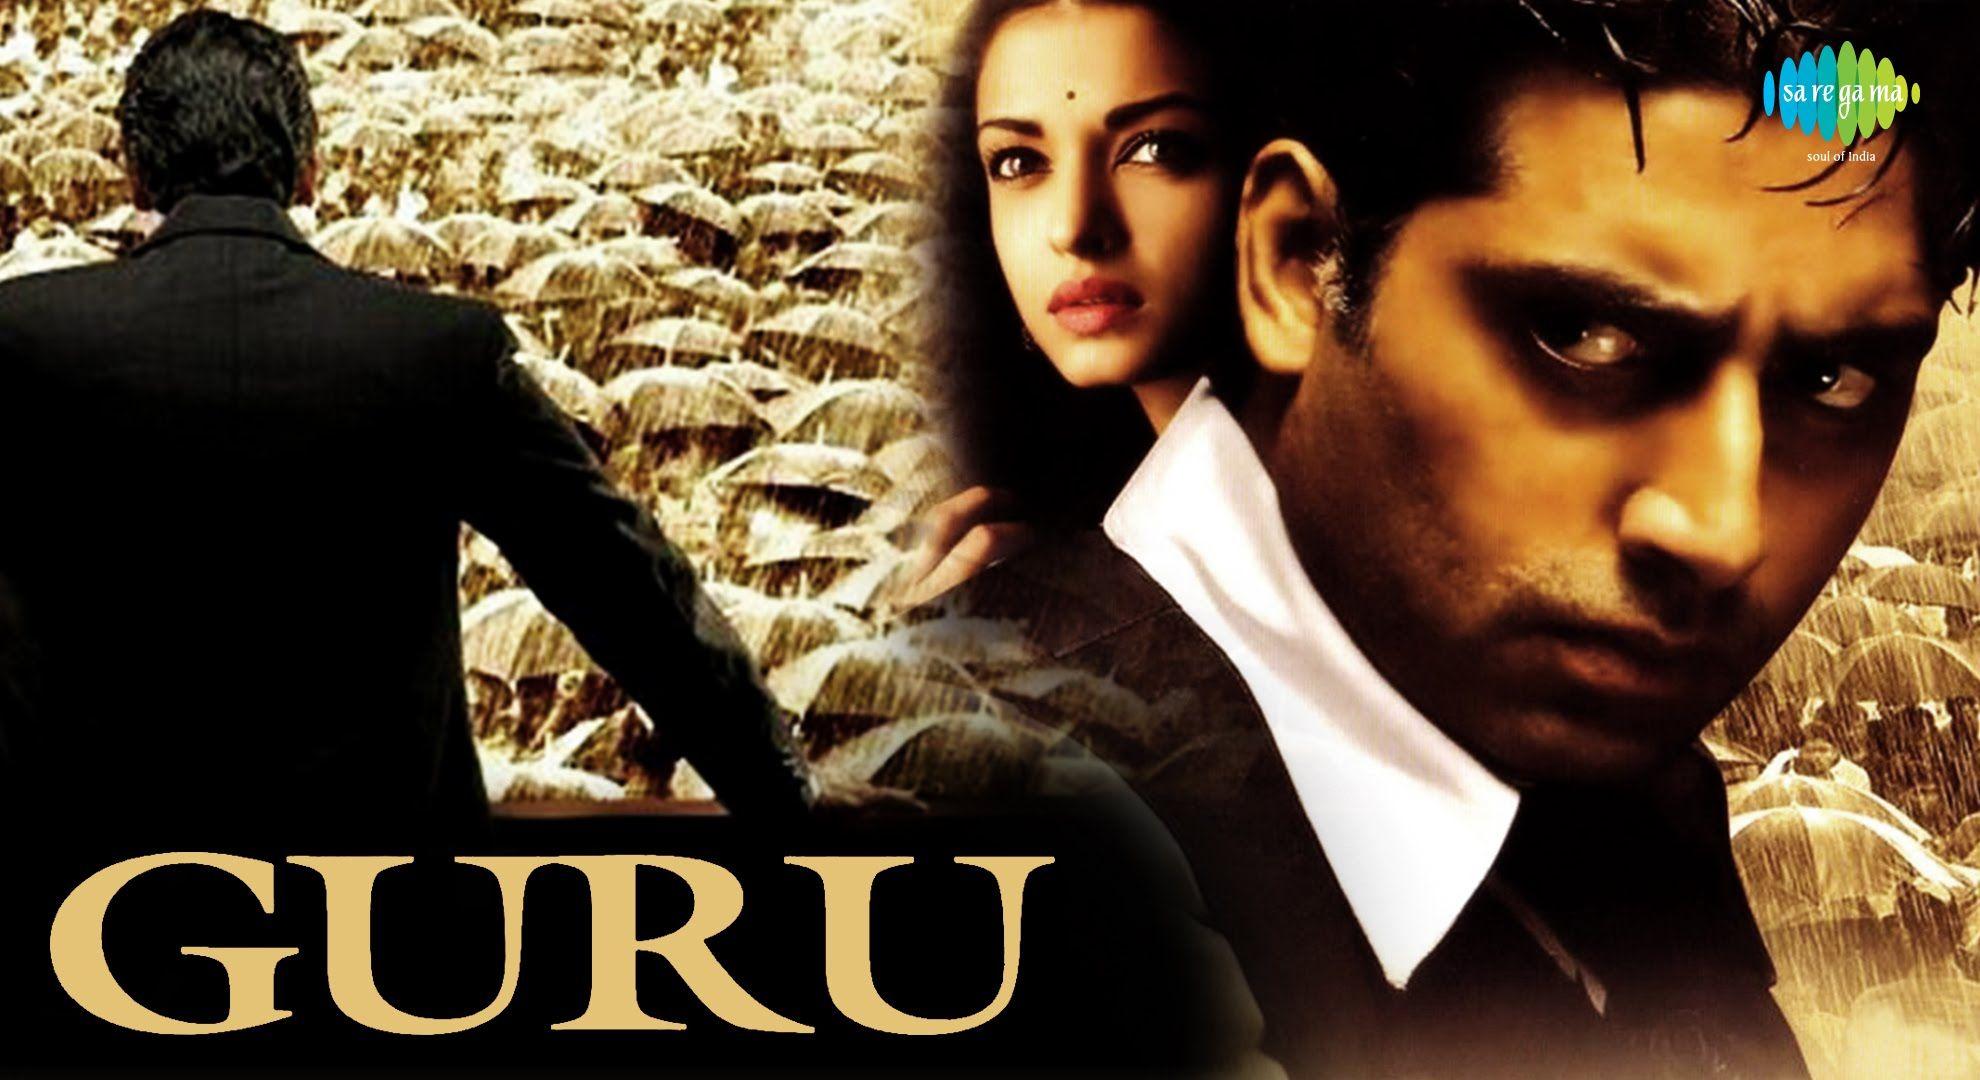 Guru 2007 Full Hindi Movie Amitabh Bachchan Abhishek Bachchan Ai